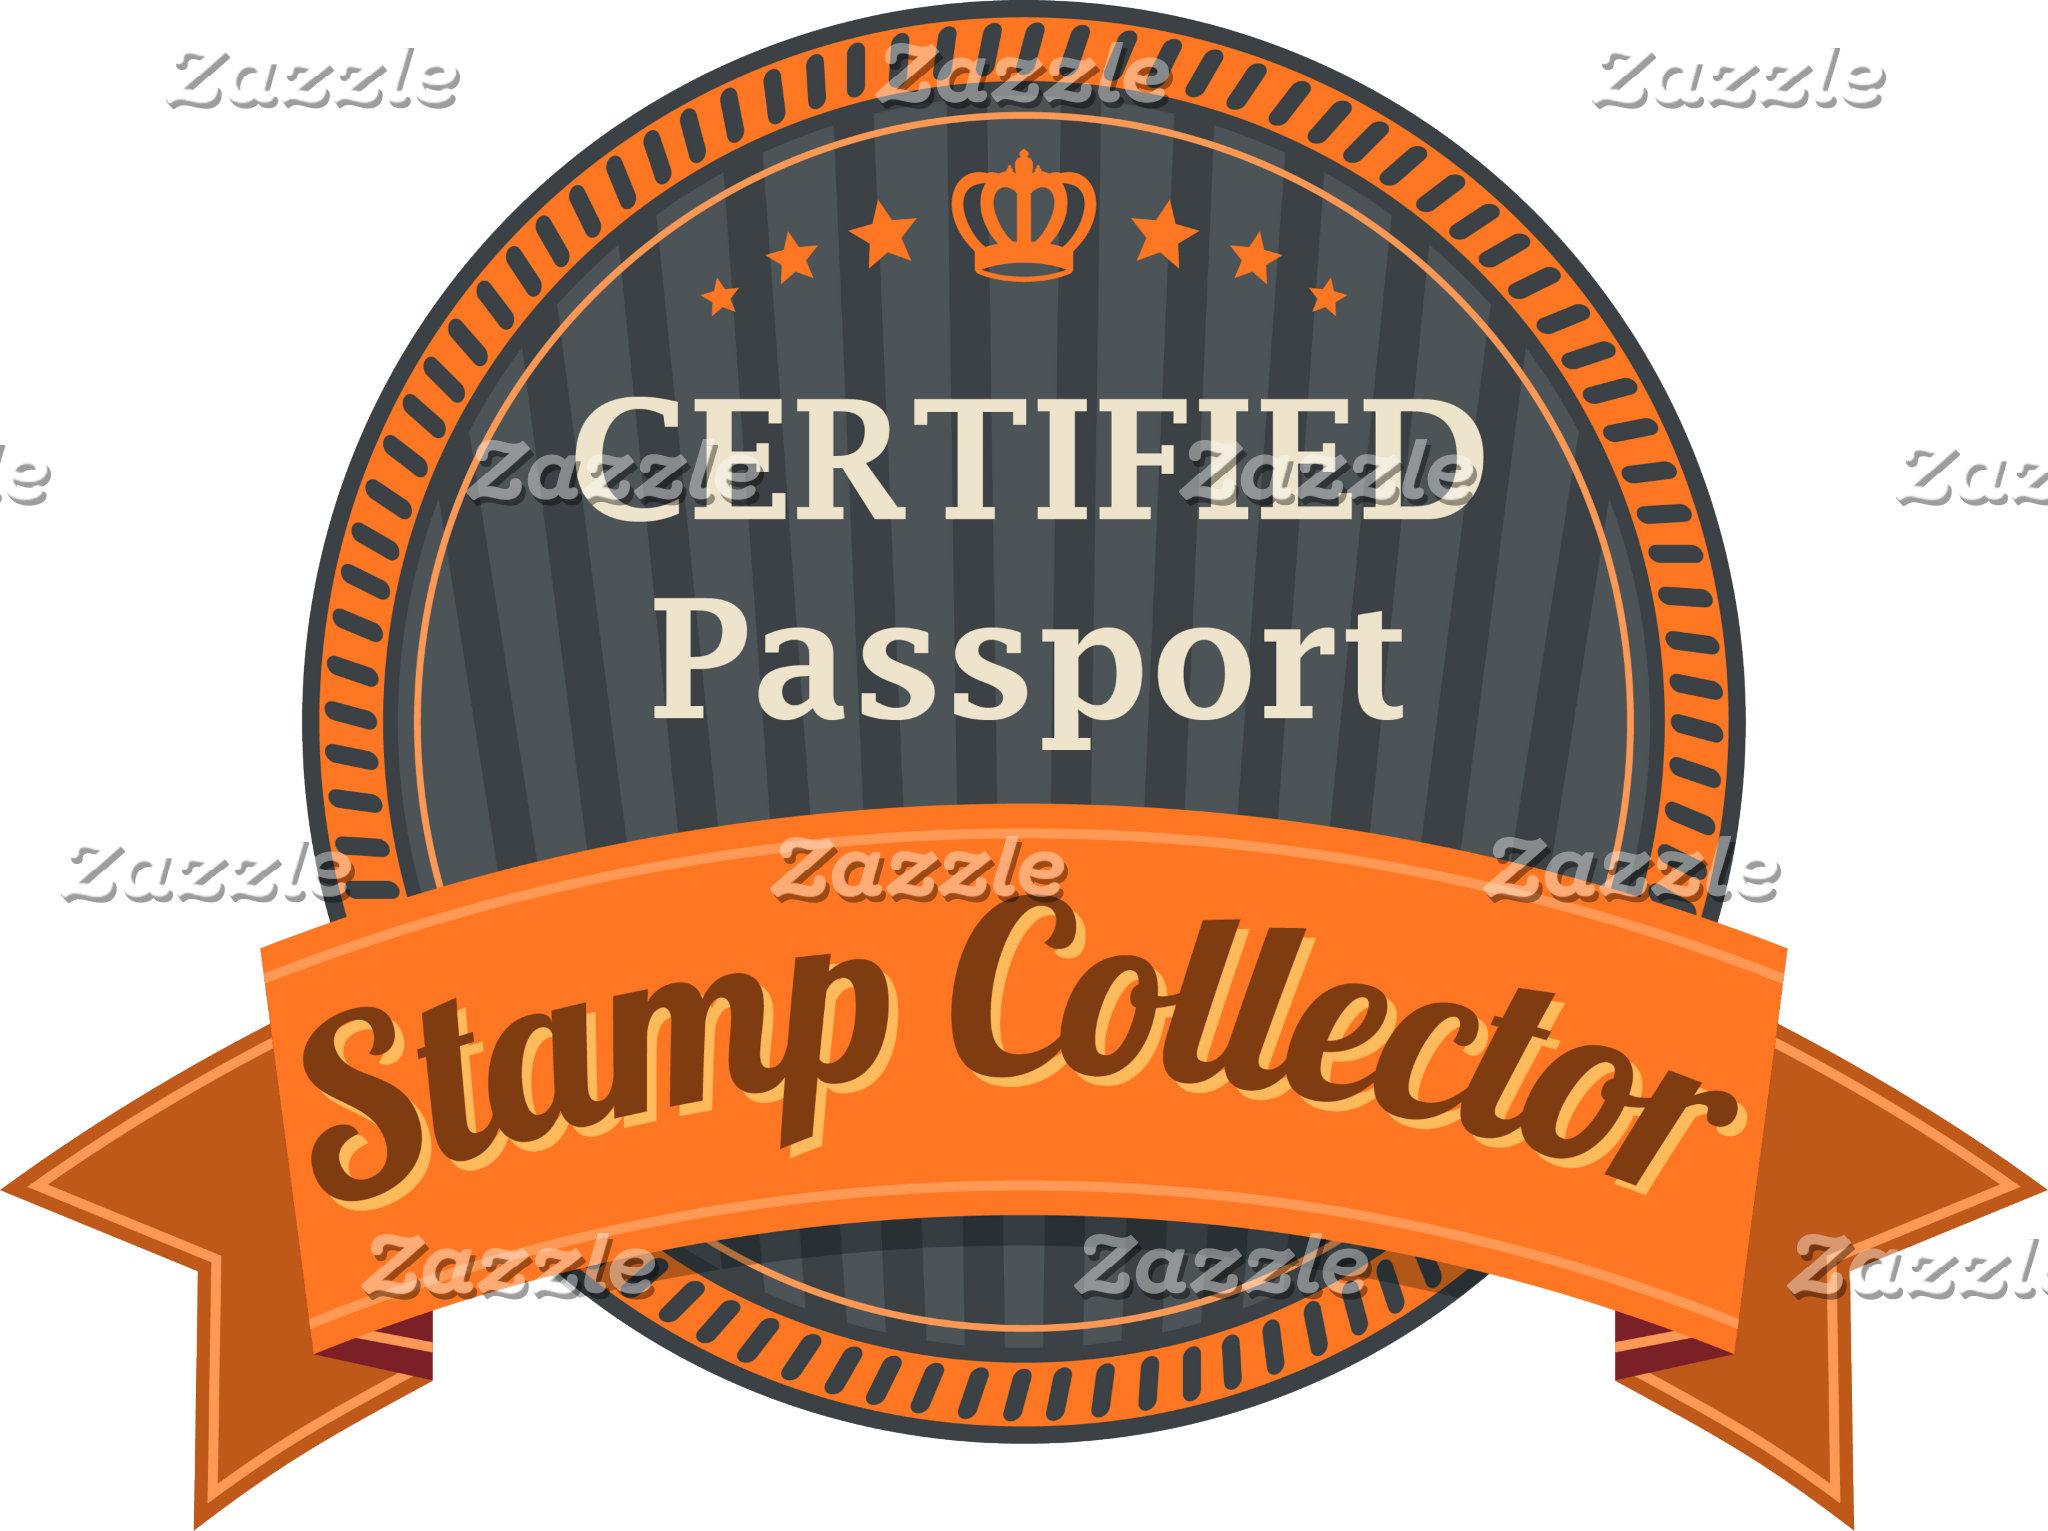 Passport Stamp Collector